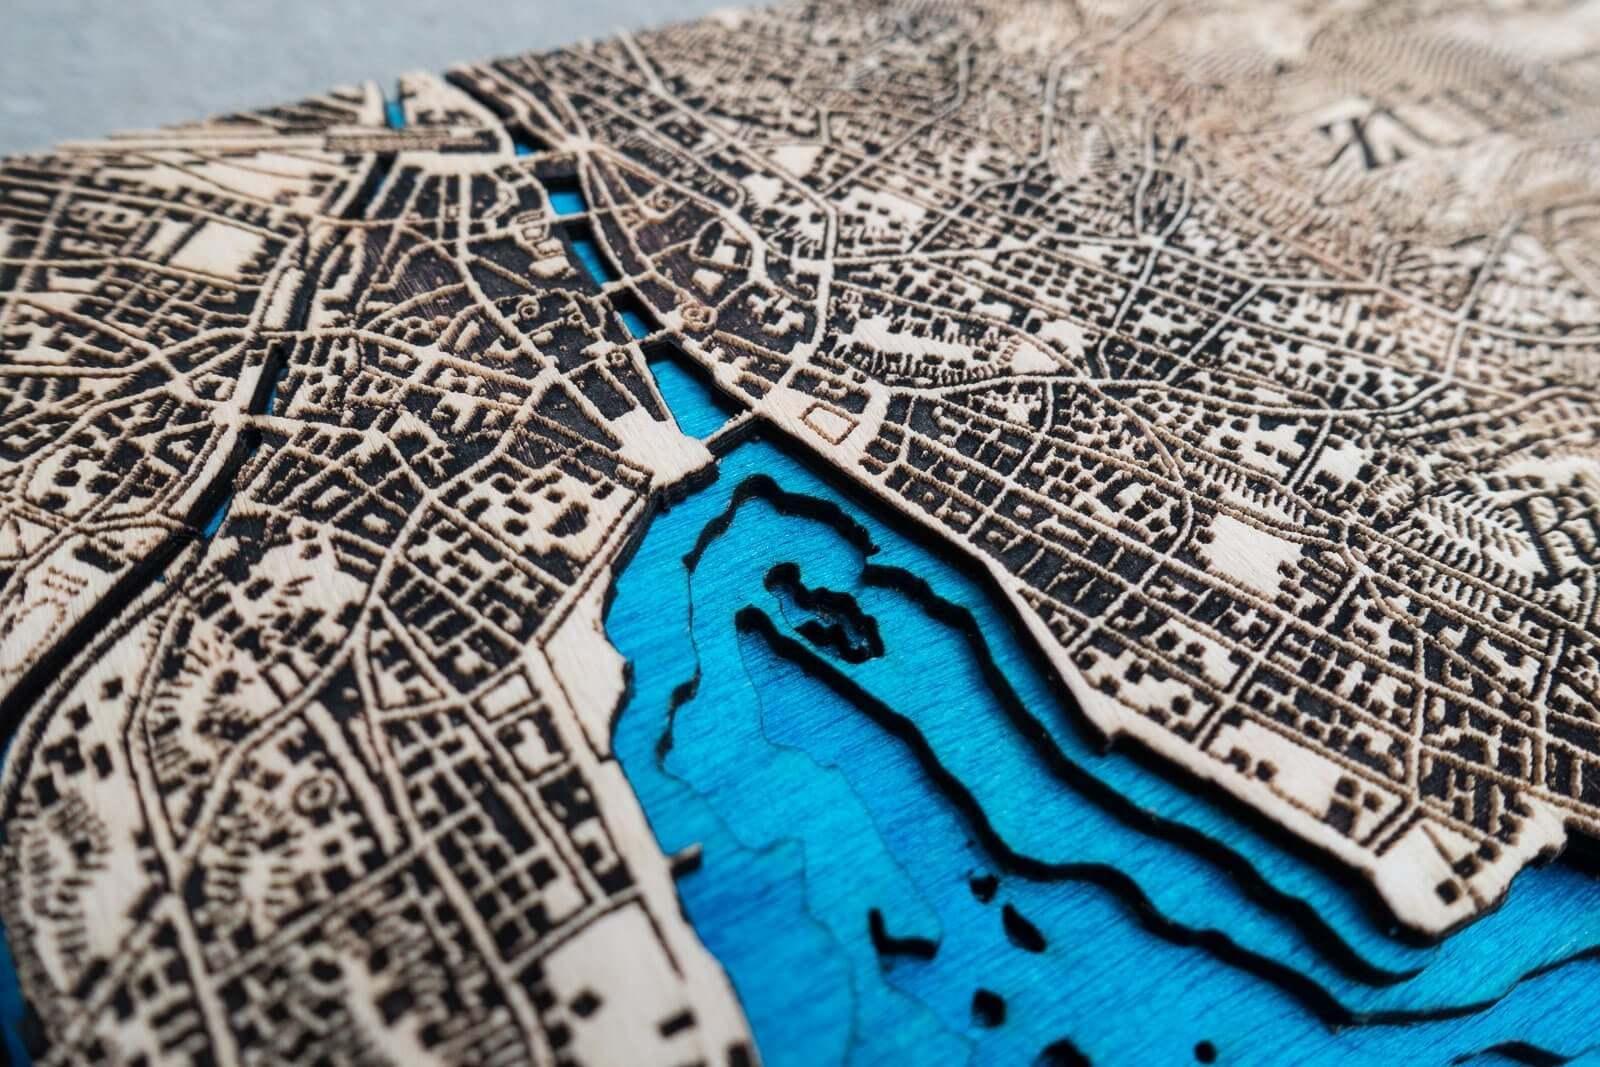 Topographic Map of Zurich | Showcase | Laser Atelier on